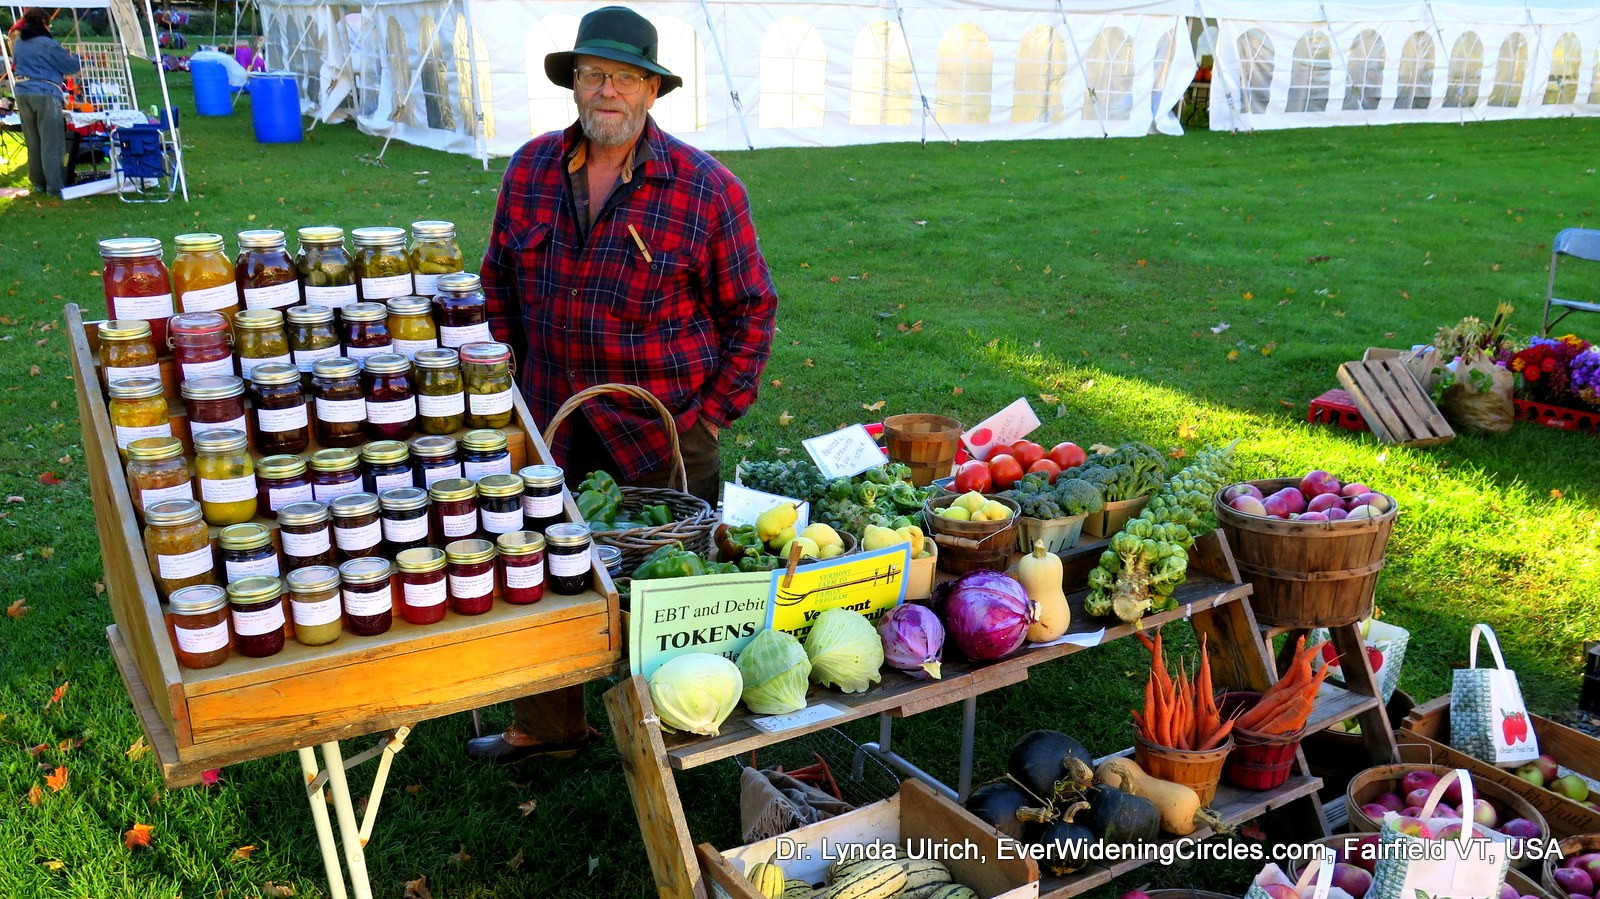 Image: Farmer's Market Vendor with bounty